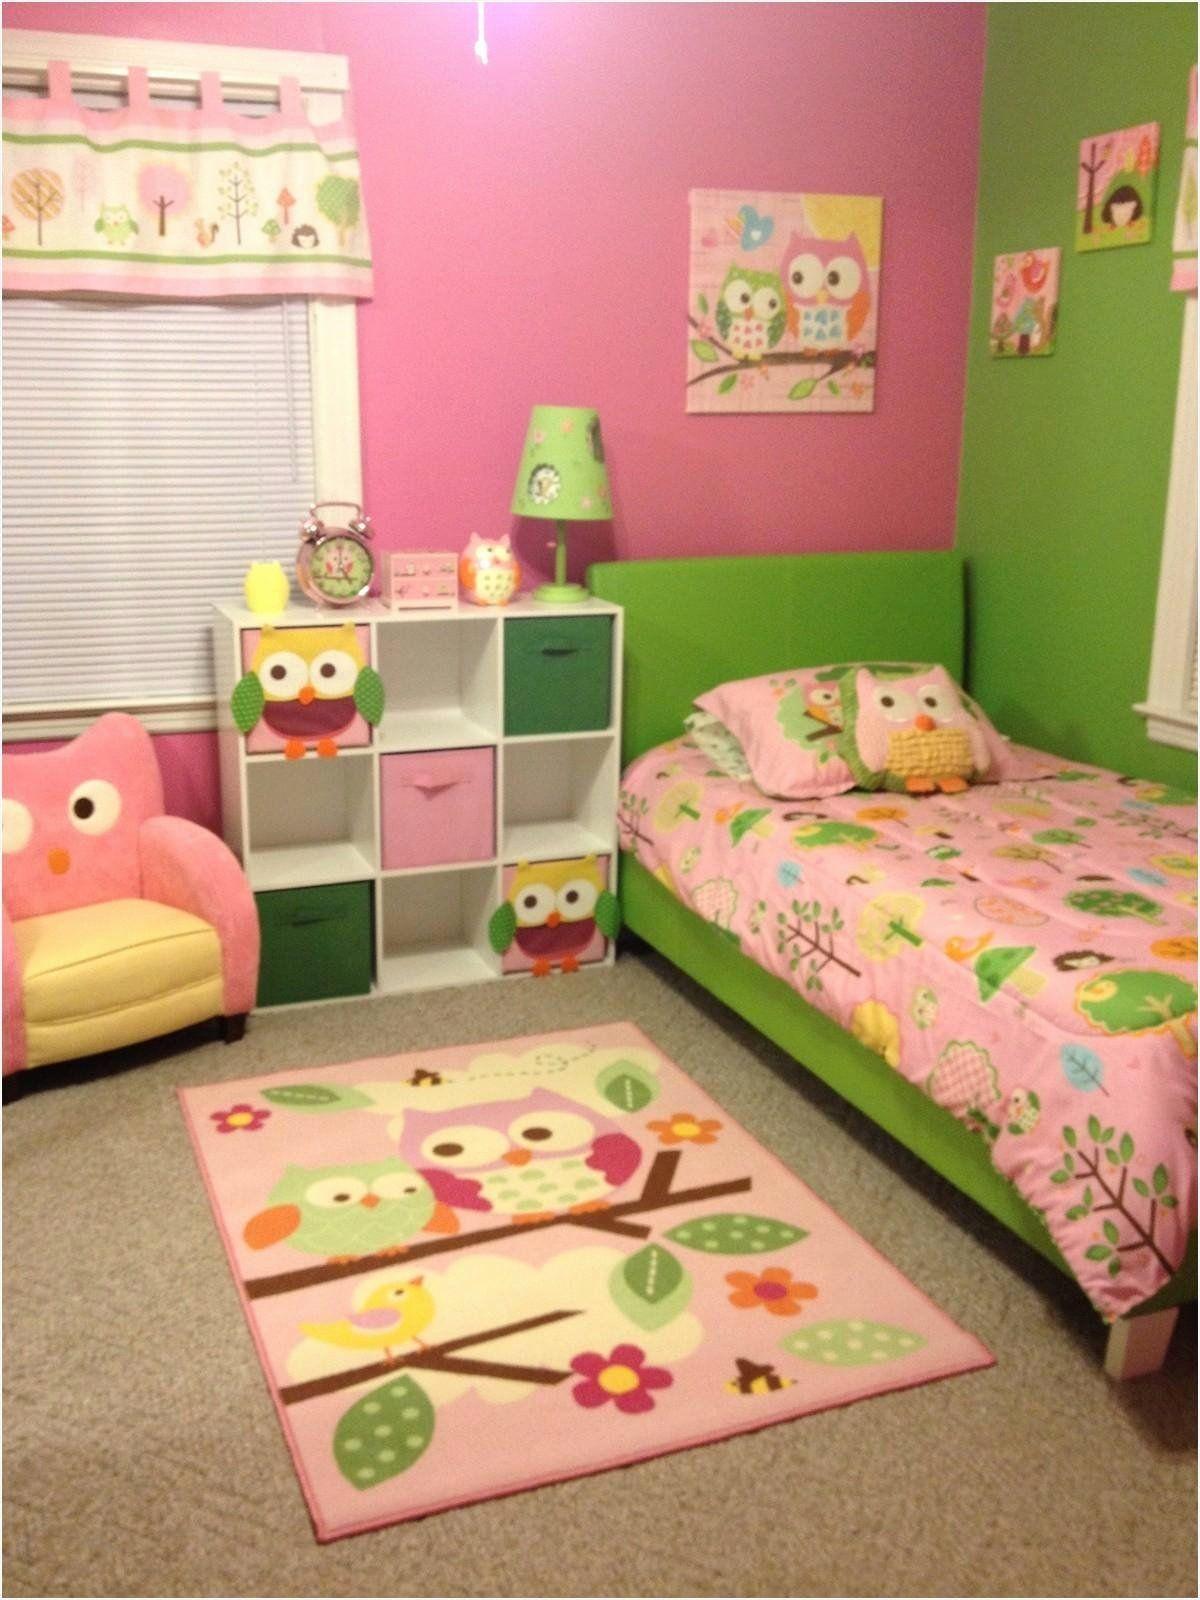 Owl Bedroom Decor Inspirational Owl Bedroom Decor Beautiful Luxury